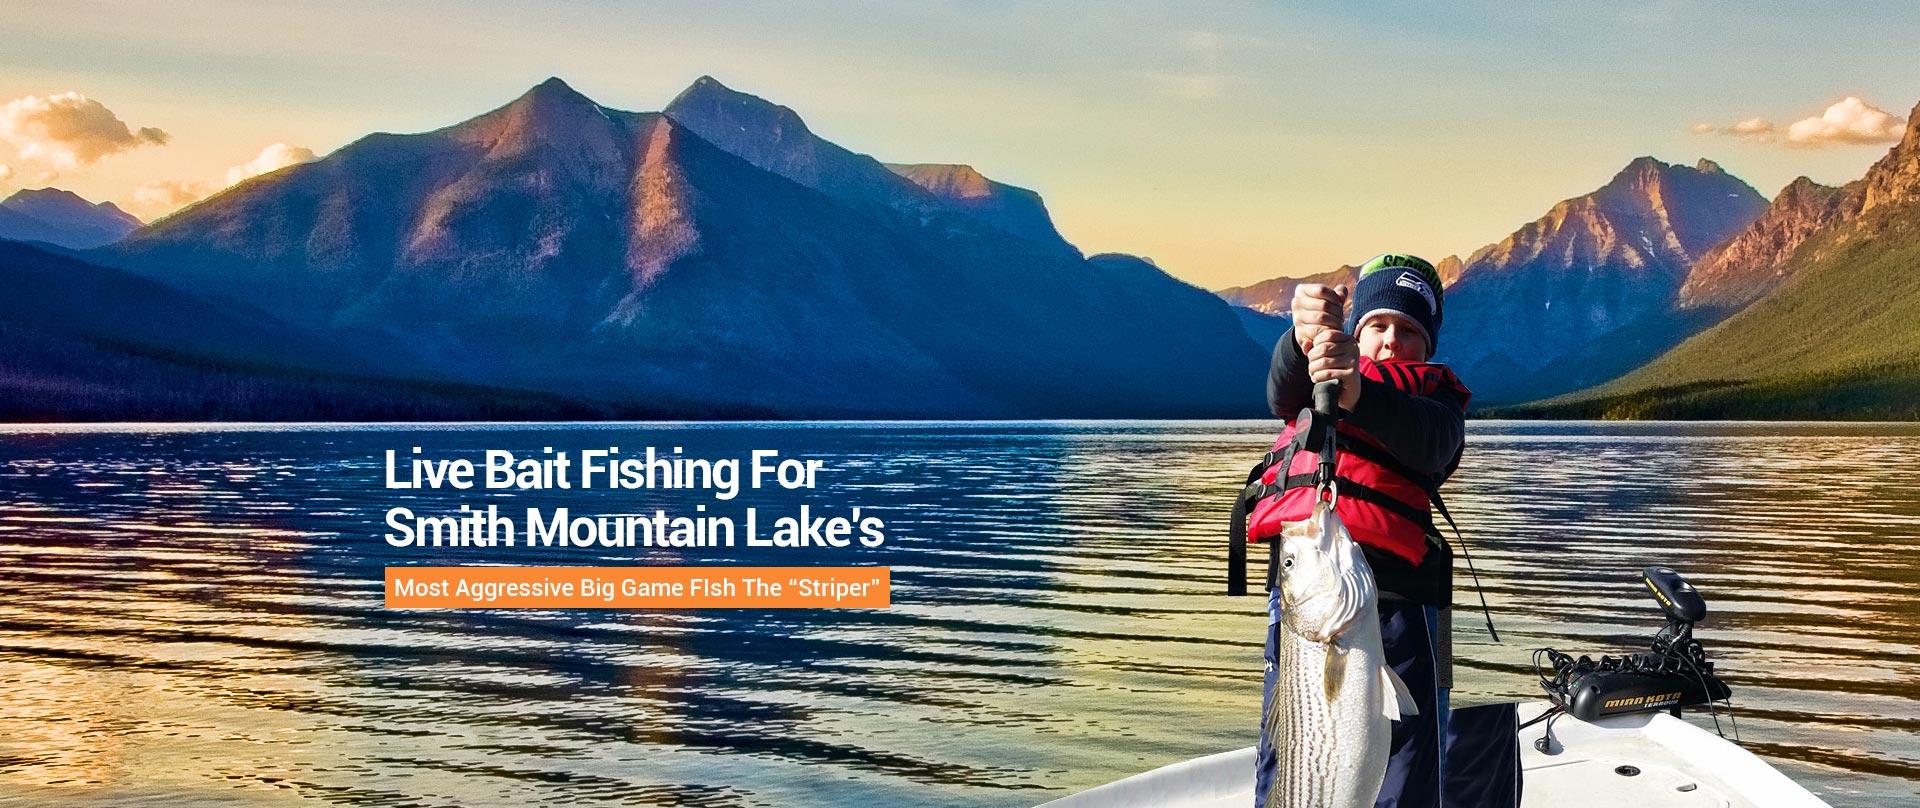 Striper fishing guide service on smith mountain lake va for Smith mountain lake striper fishing